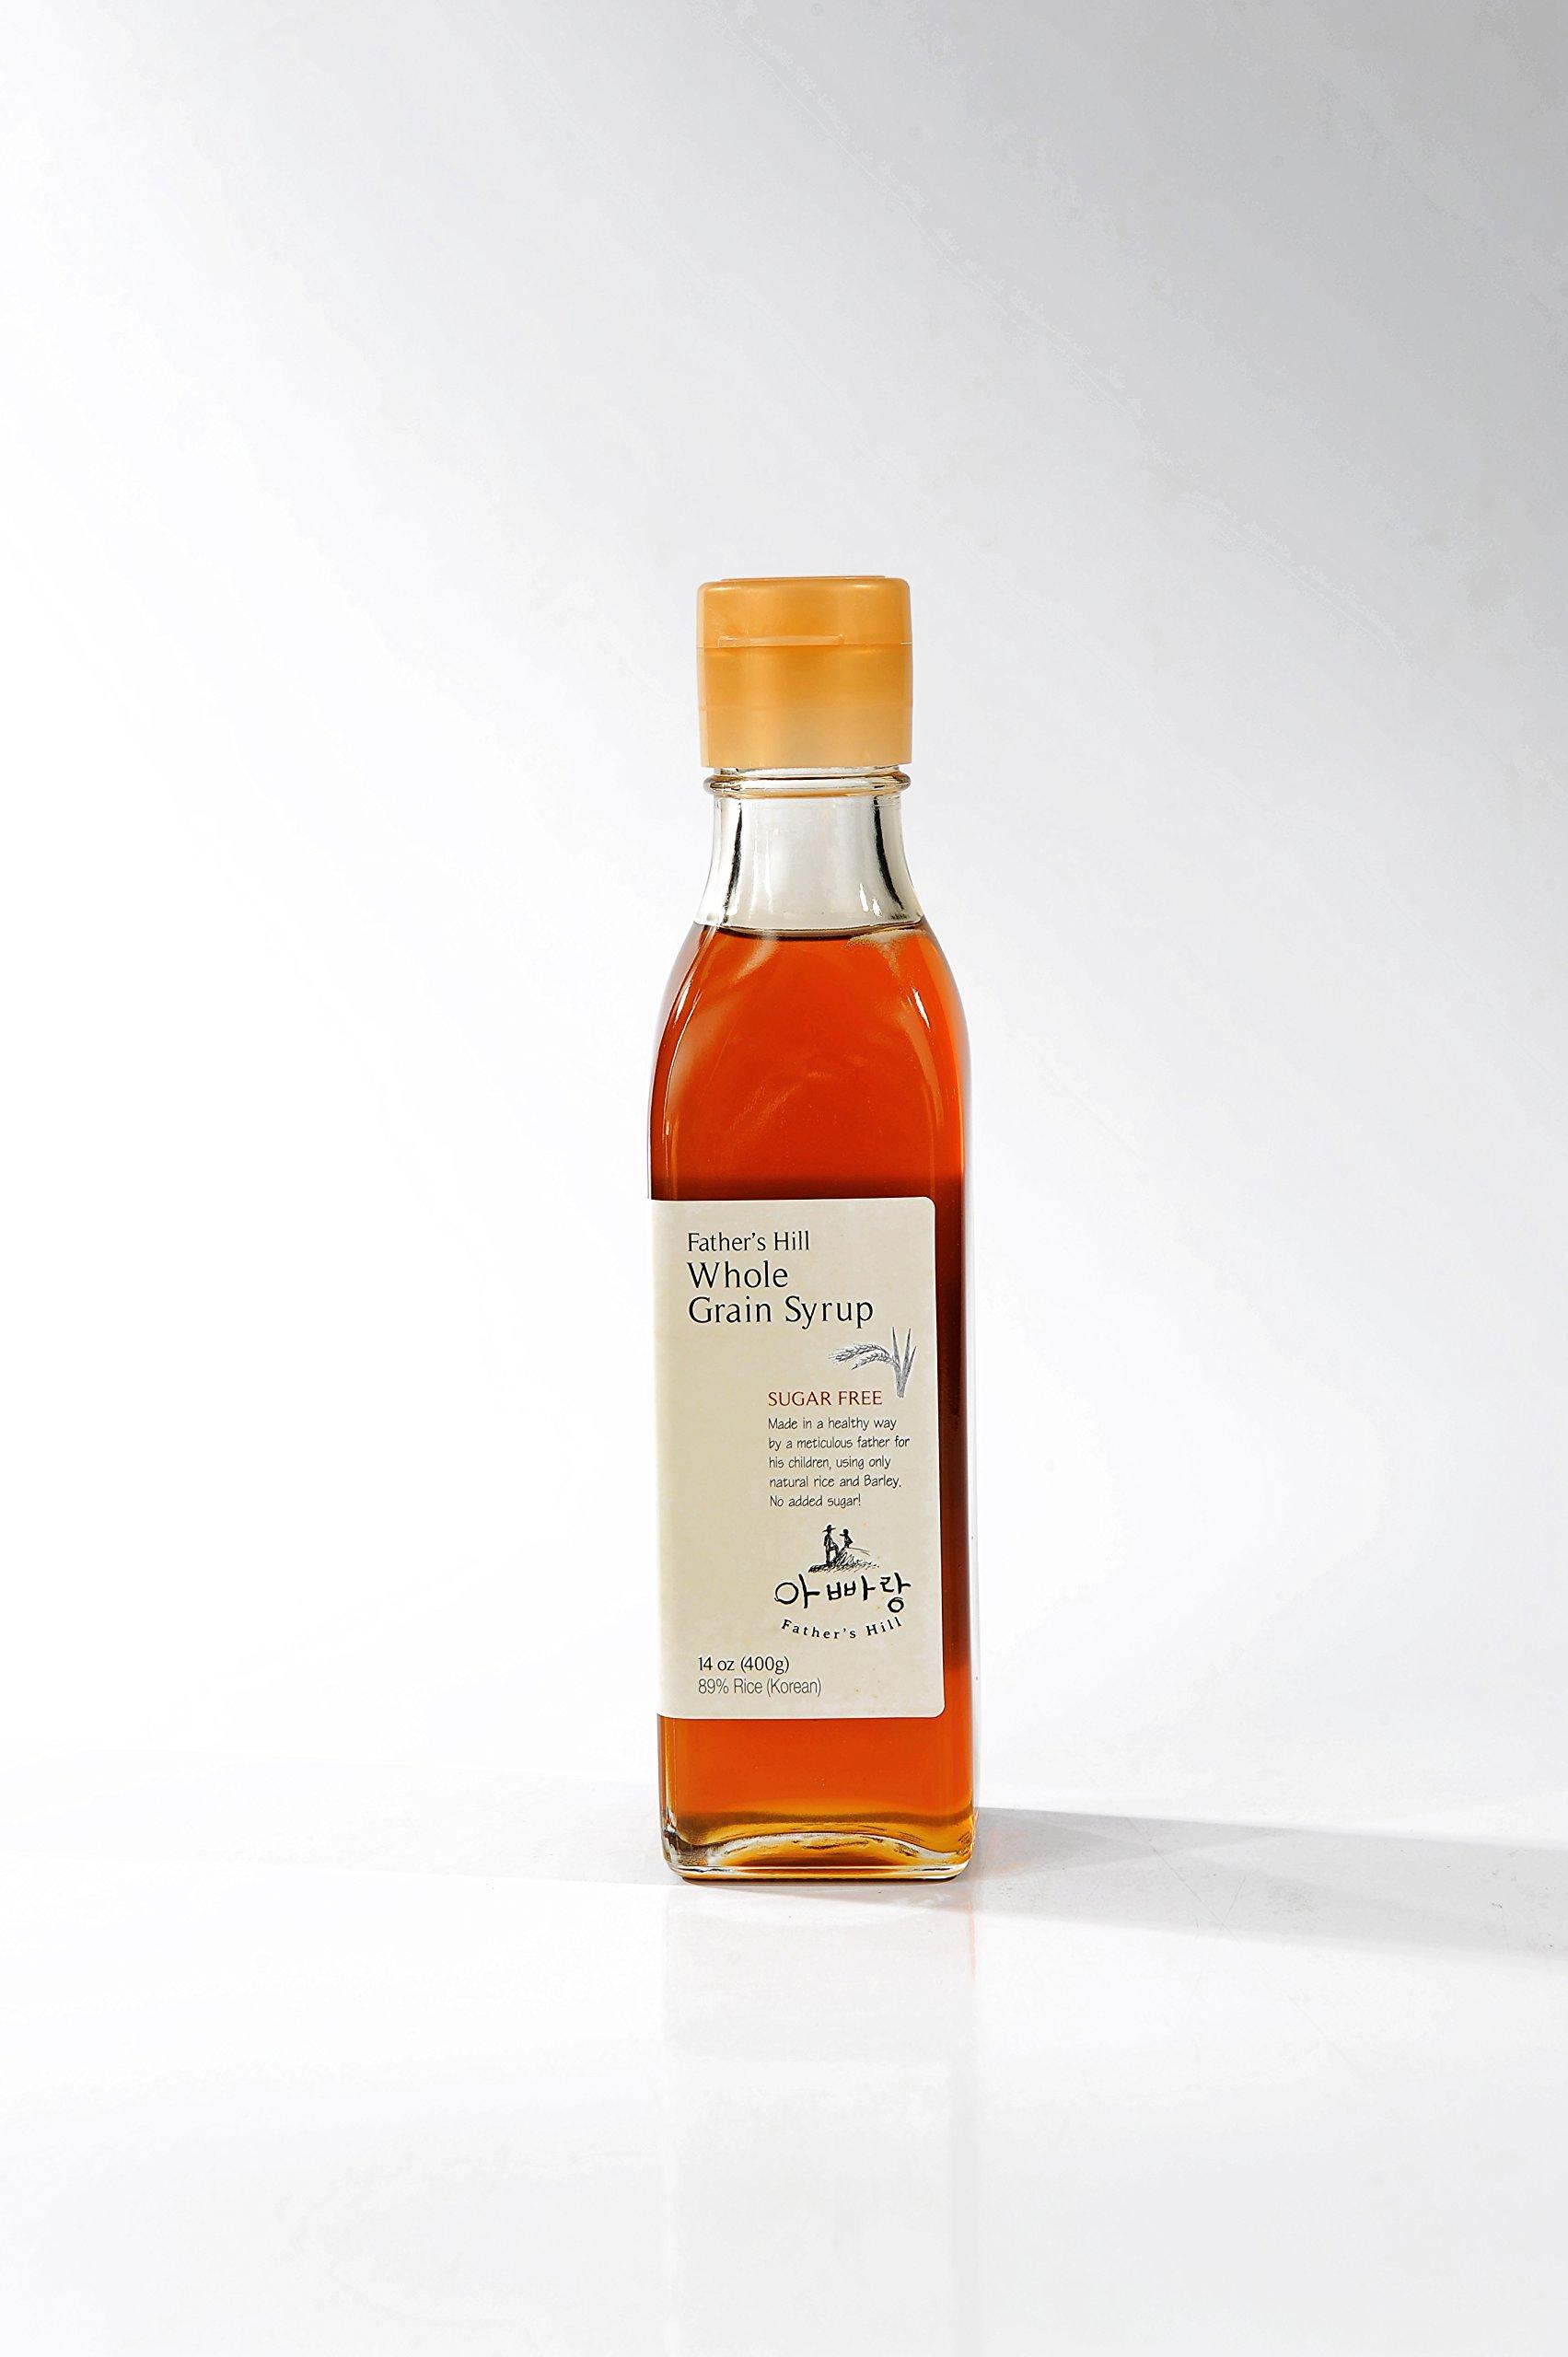 [Father's hill] Whole Grain Syrup, Sugar Free